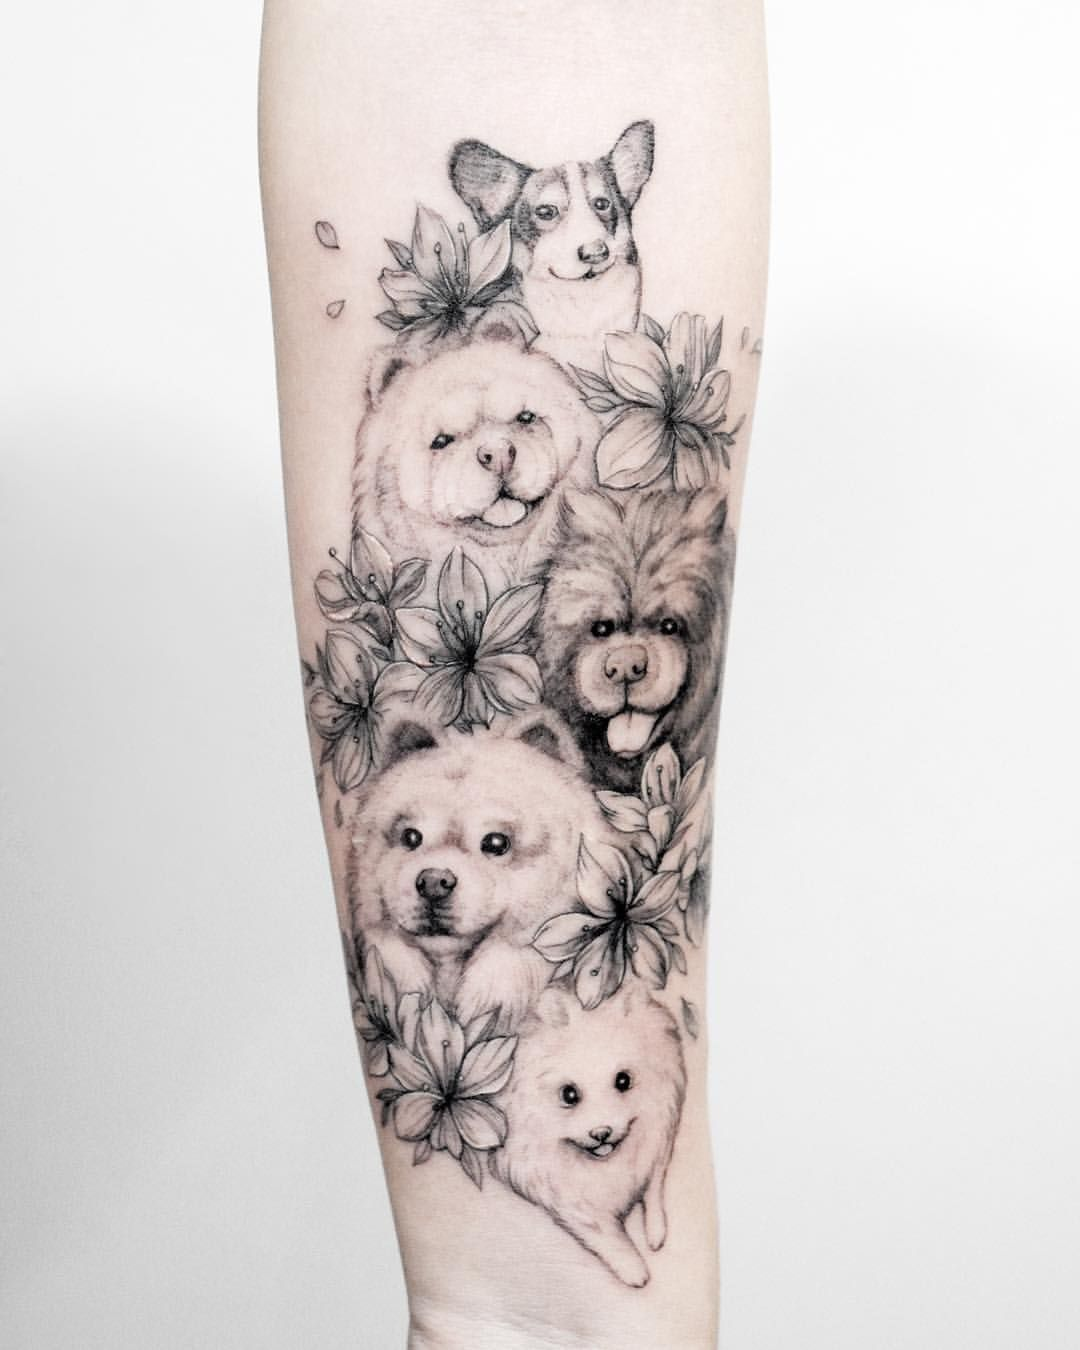 Tattoos In 2020 Hundeportrait Tattoo Gesichtstattoos Hund Tattoo Ideen